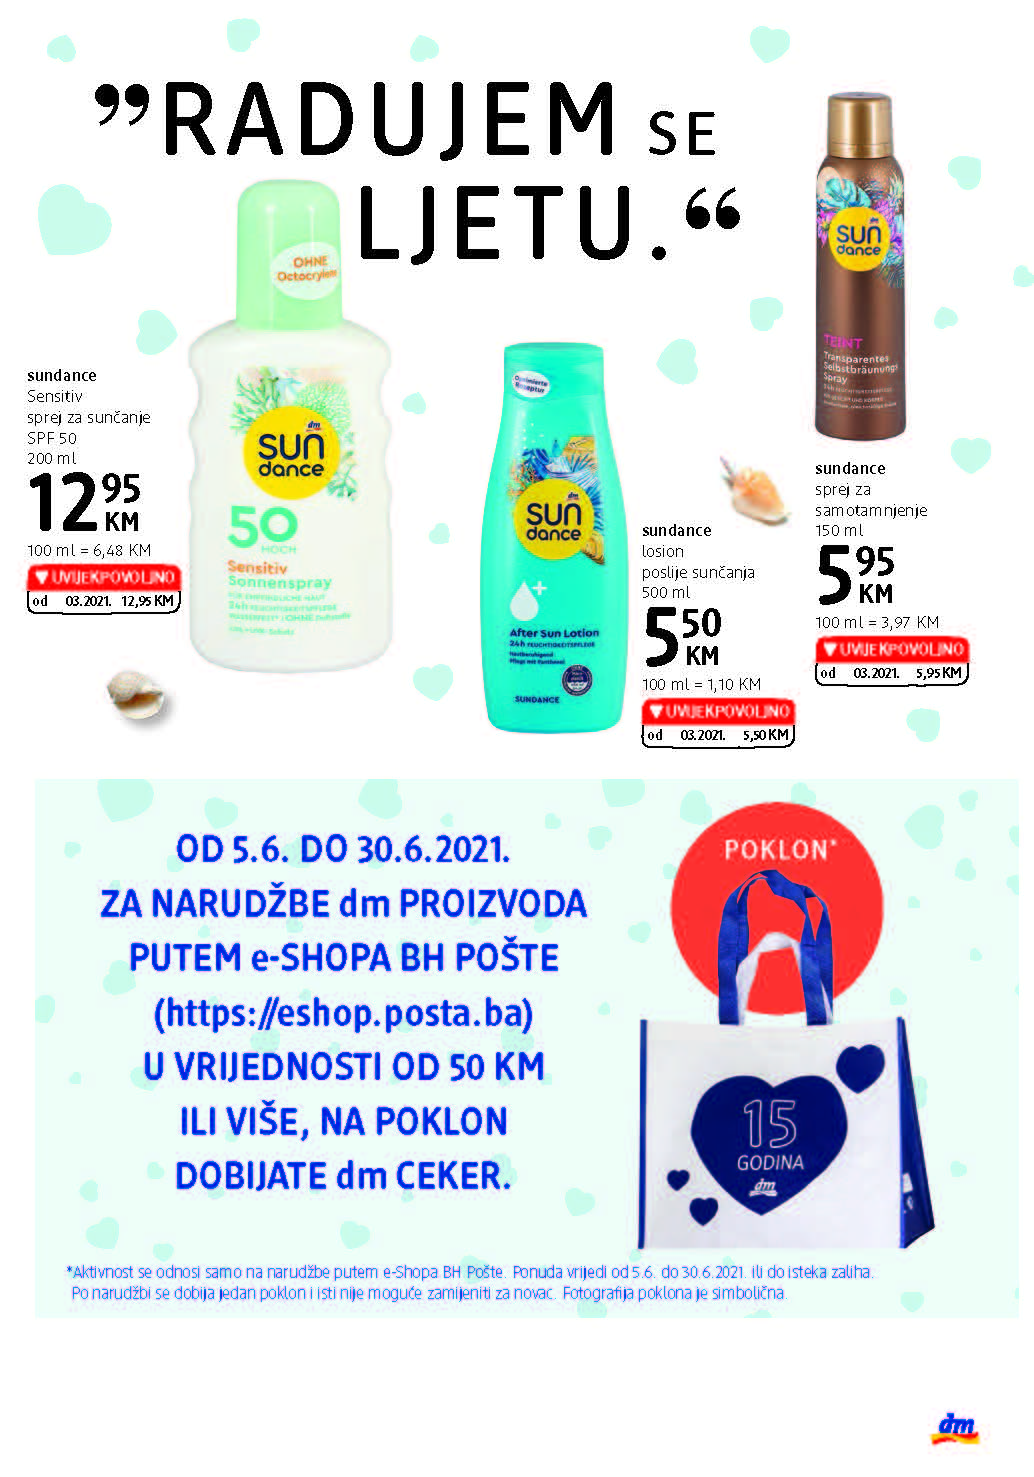 DM Katalog BiH JUN 2021 09.06. 22.06. eKatalozi.com PR Page 03